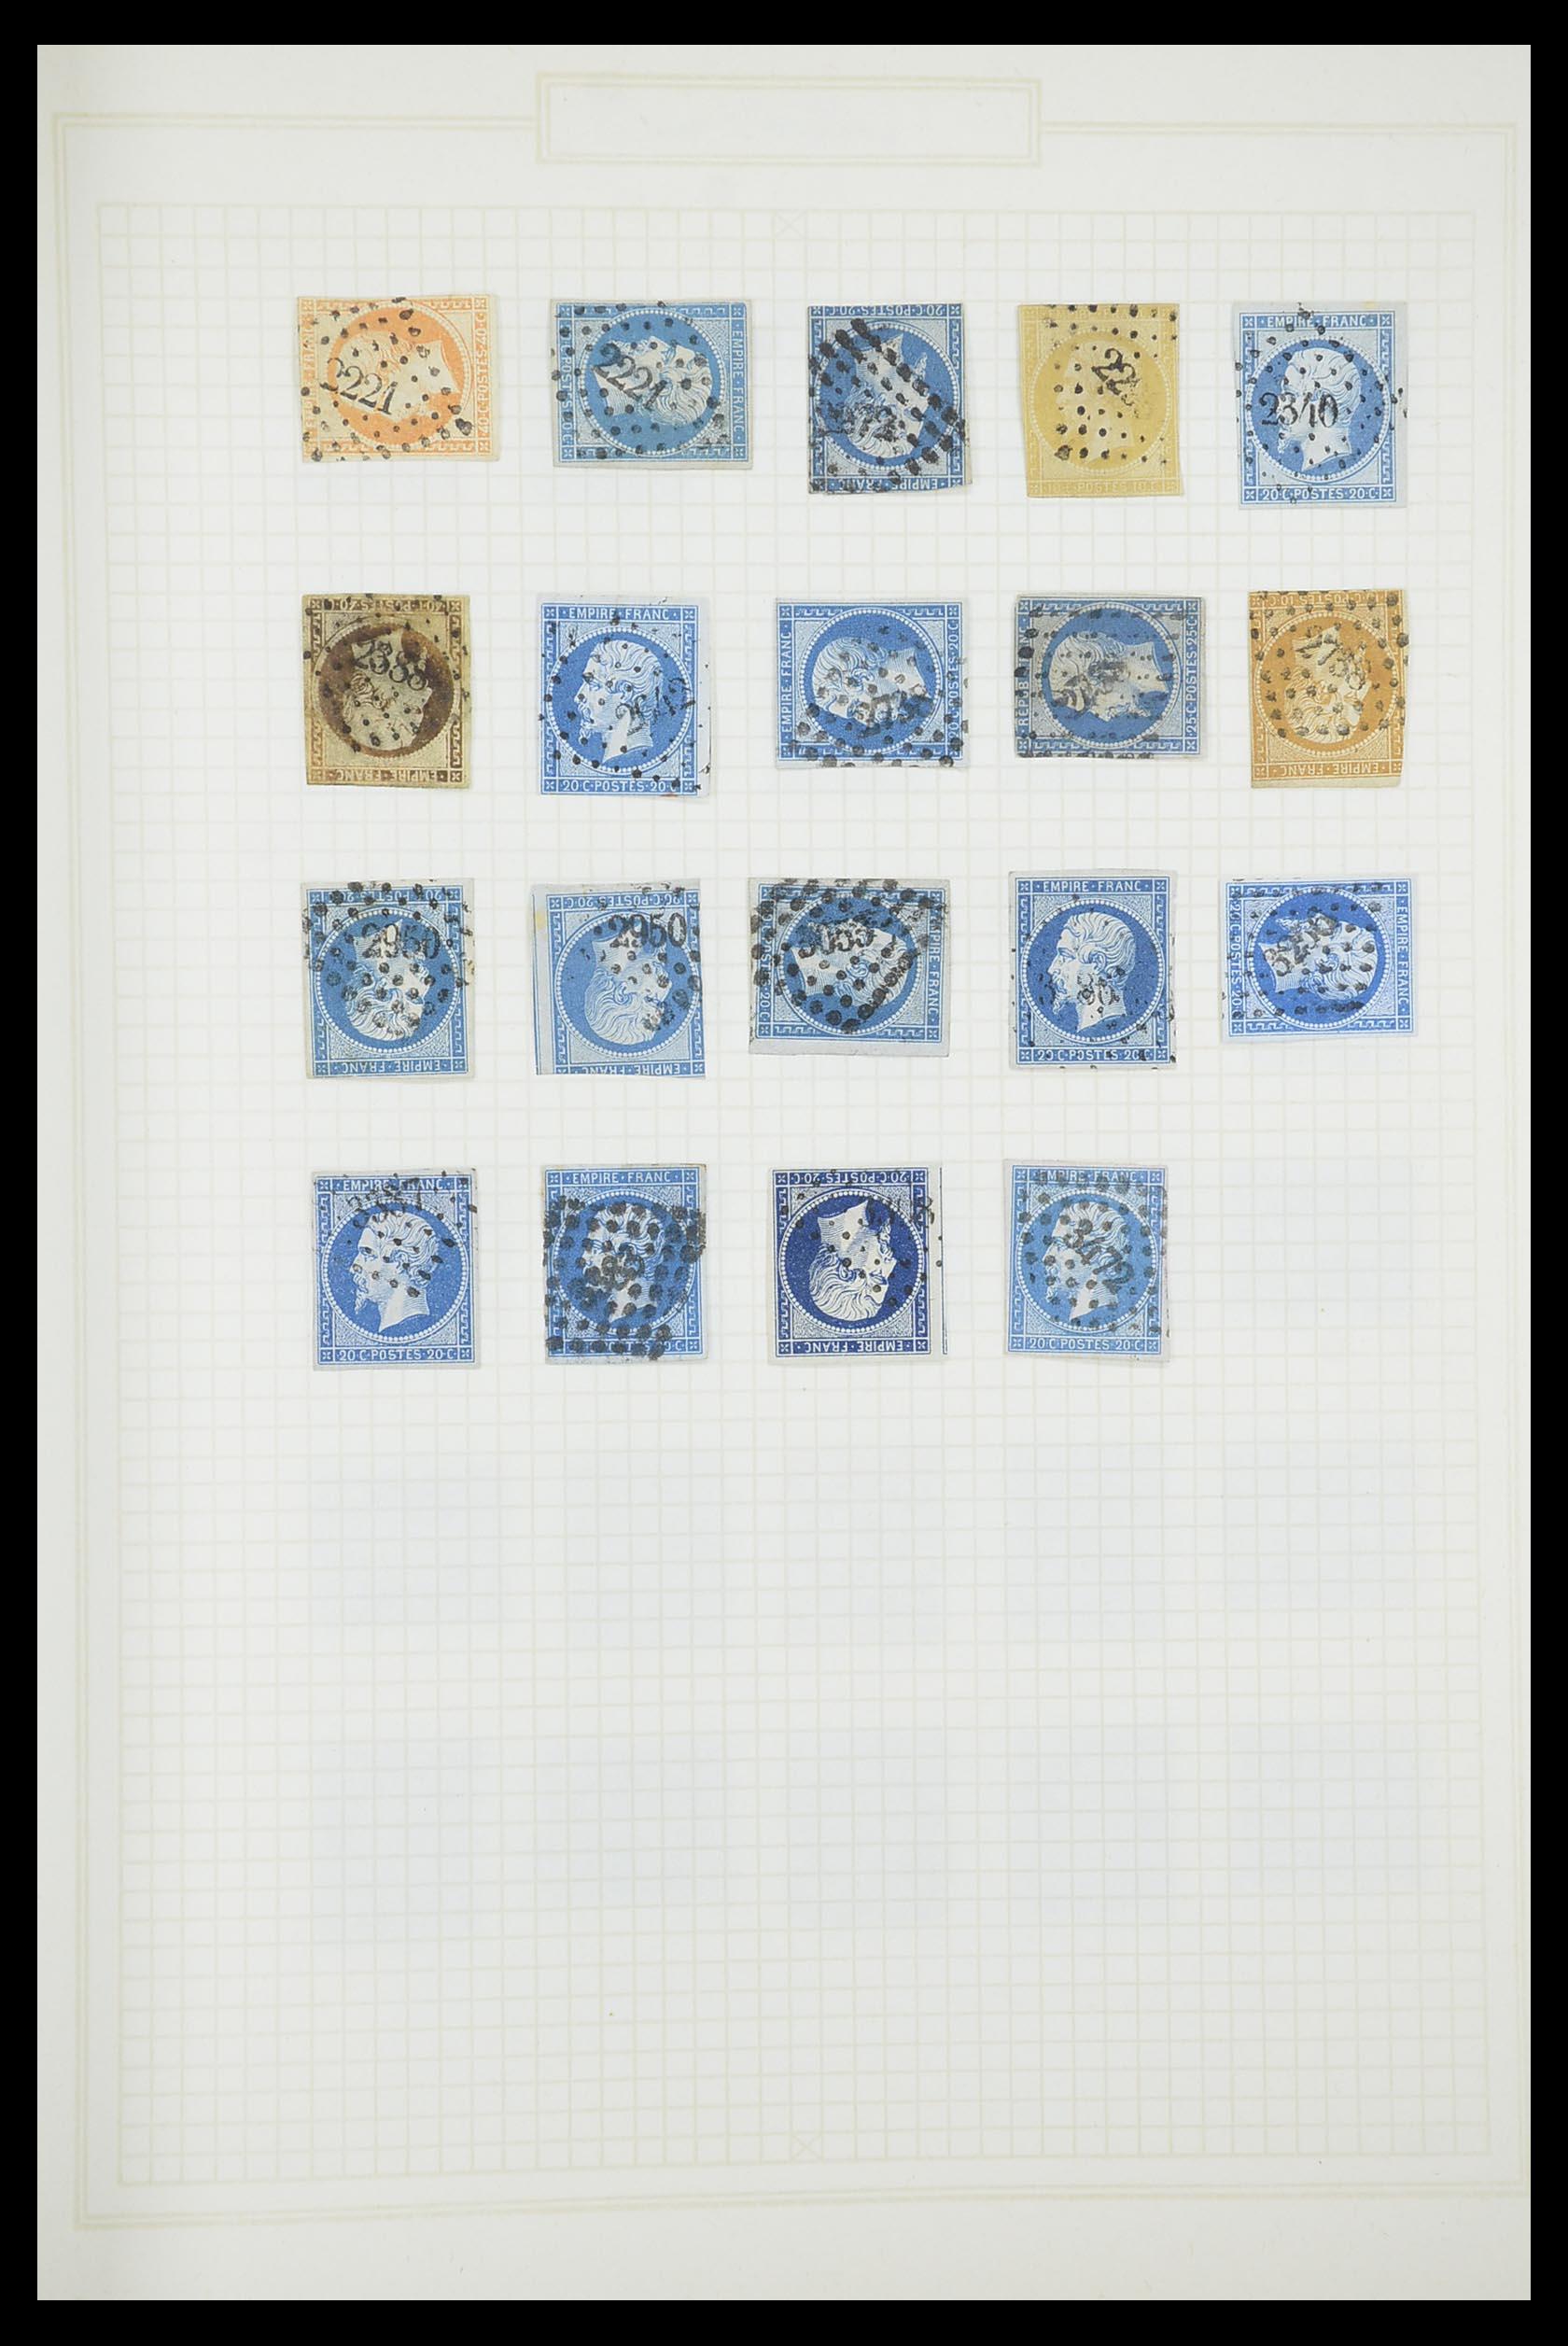 33851 010 - Postzegelverzameling 33851 Frankrijk klassiek stempels.